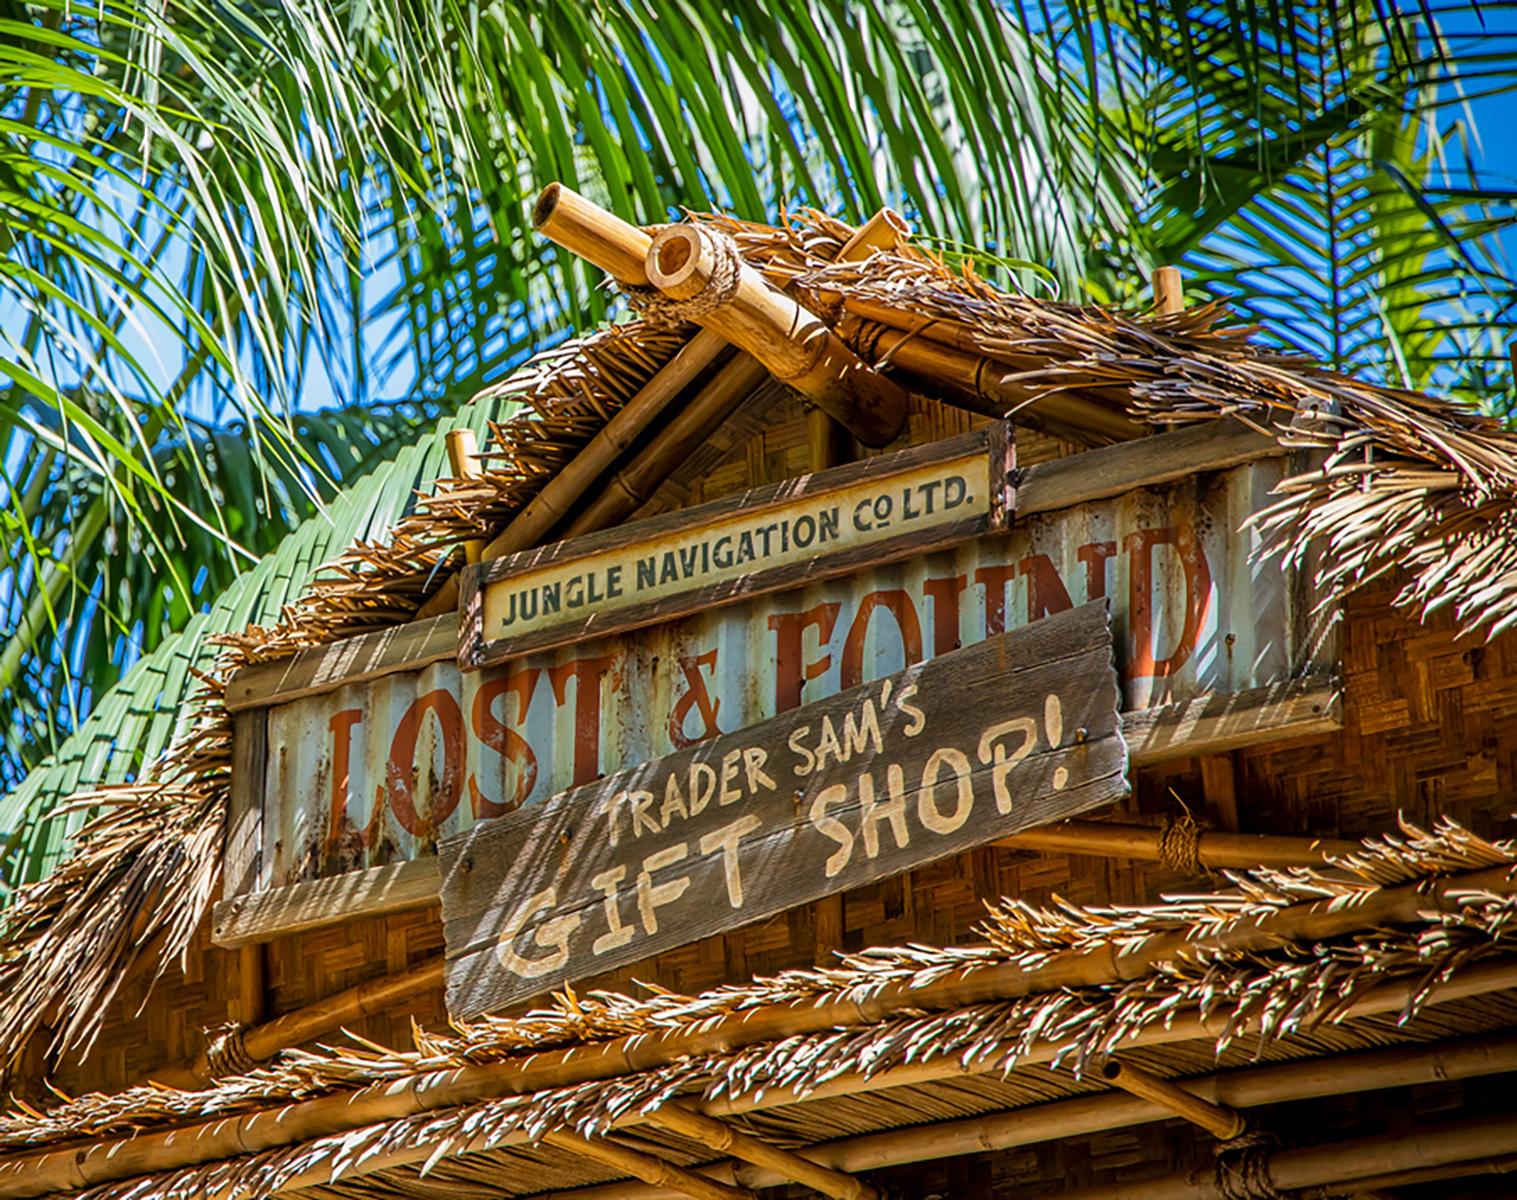 disneyland-jungle-cruise-navigation-co-ltd-lost-and-found-trader-sams-gift-shop